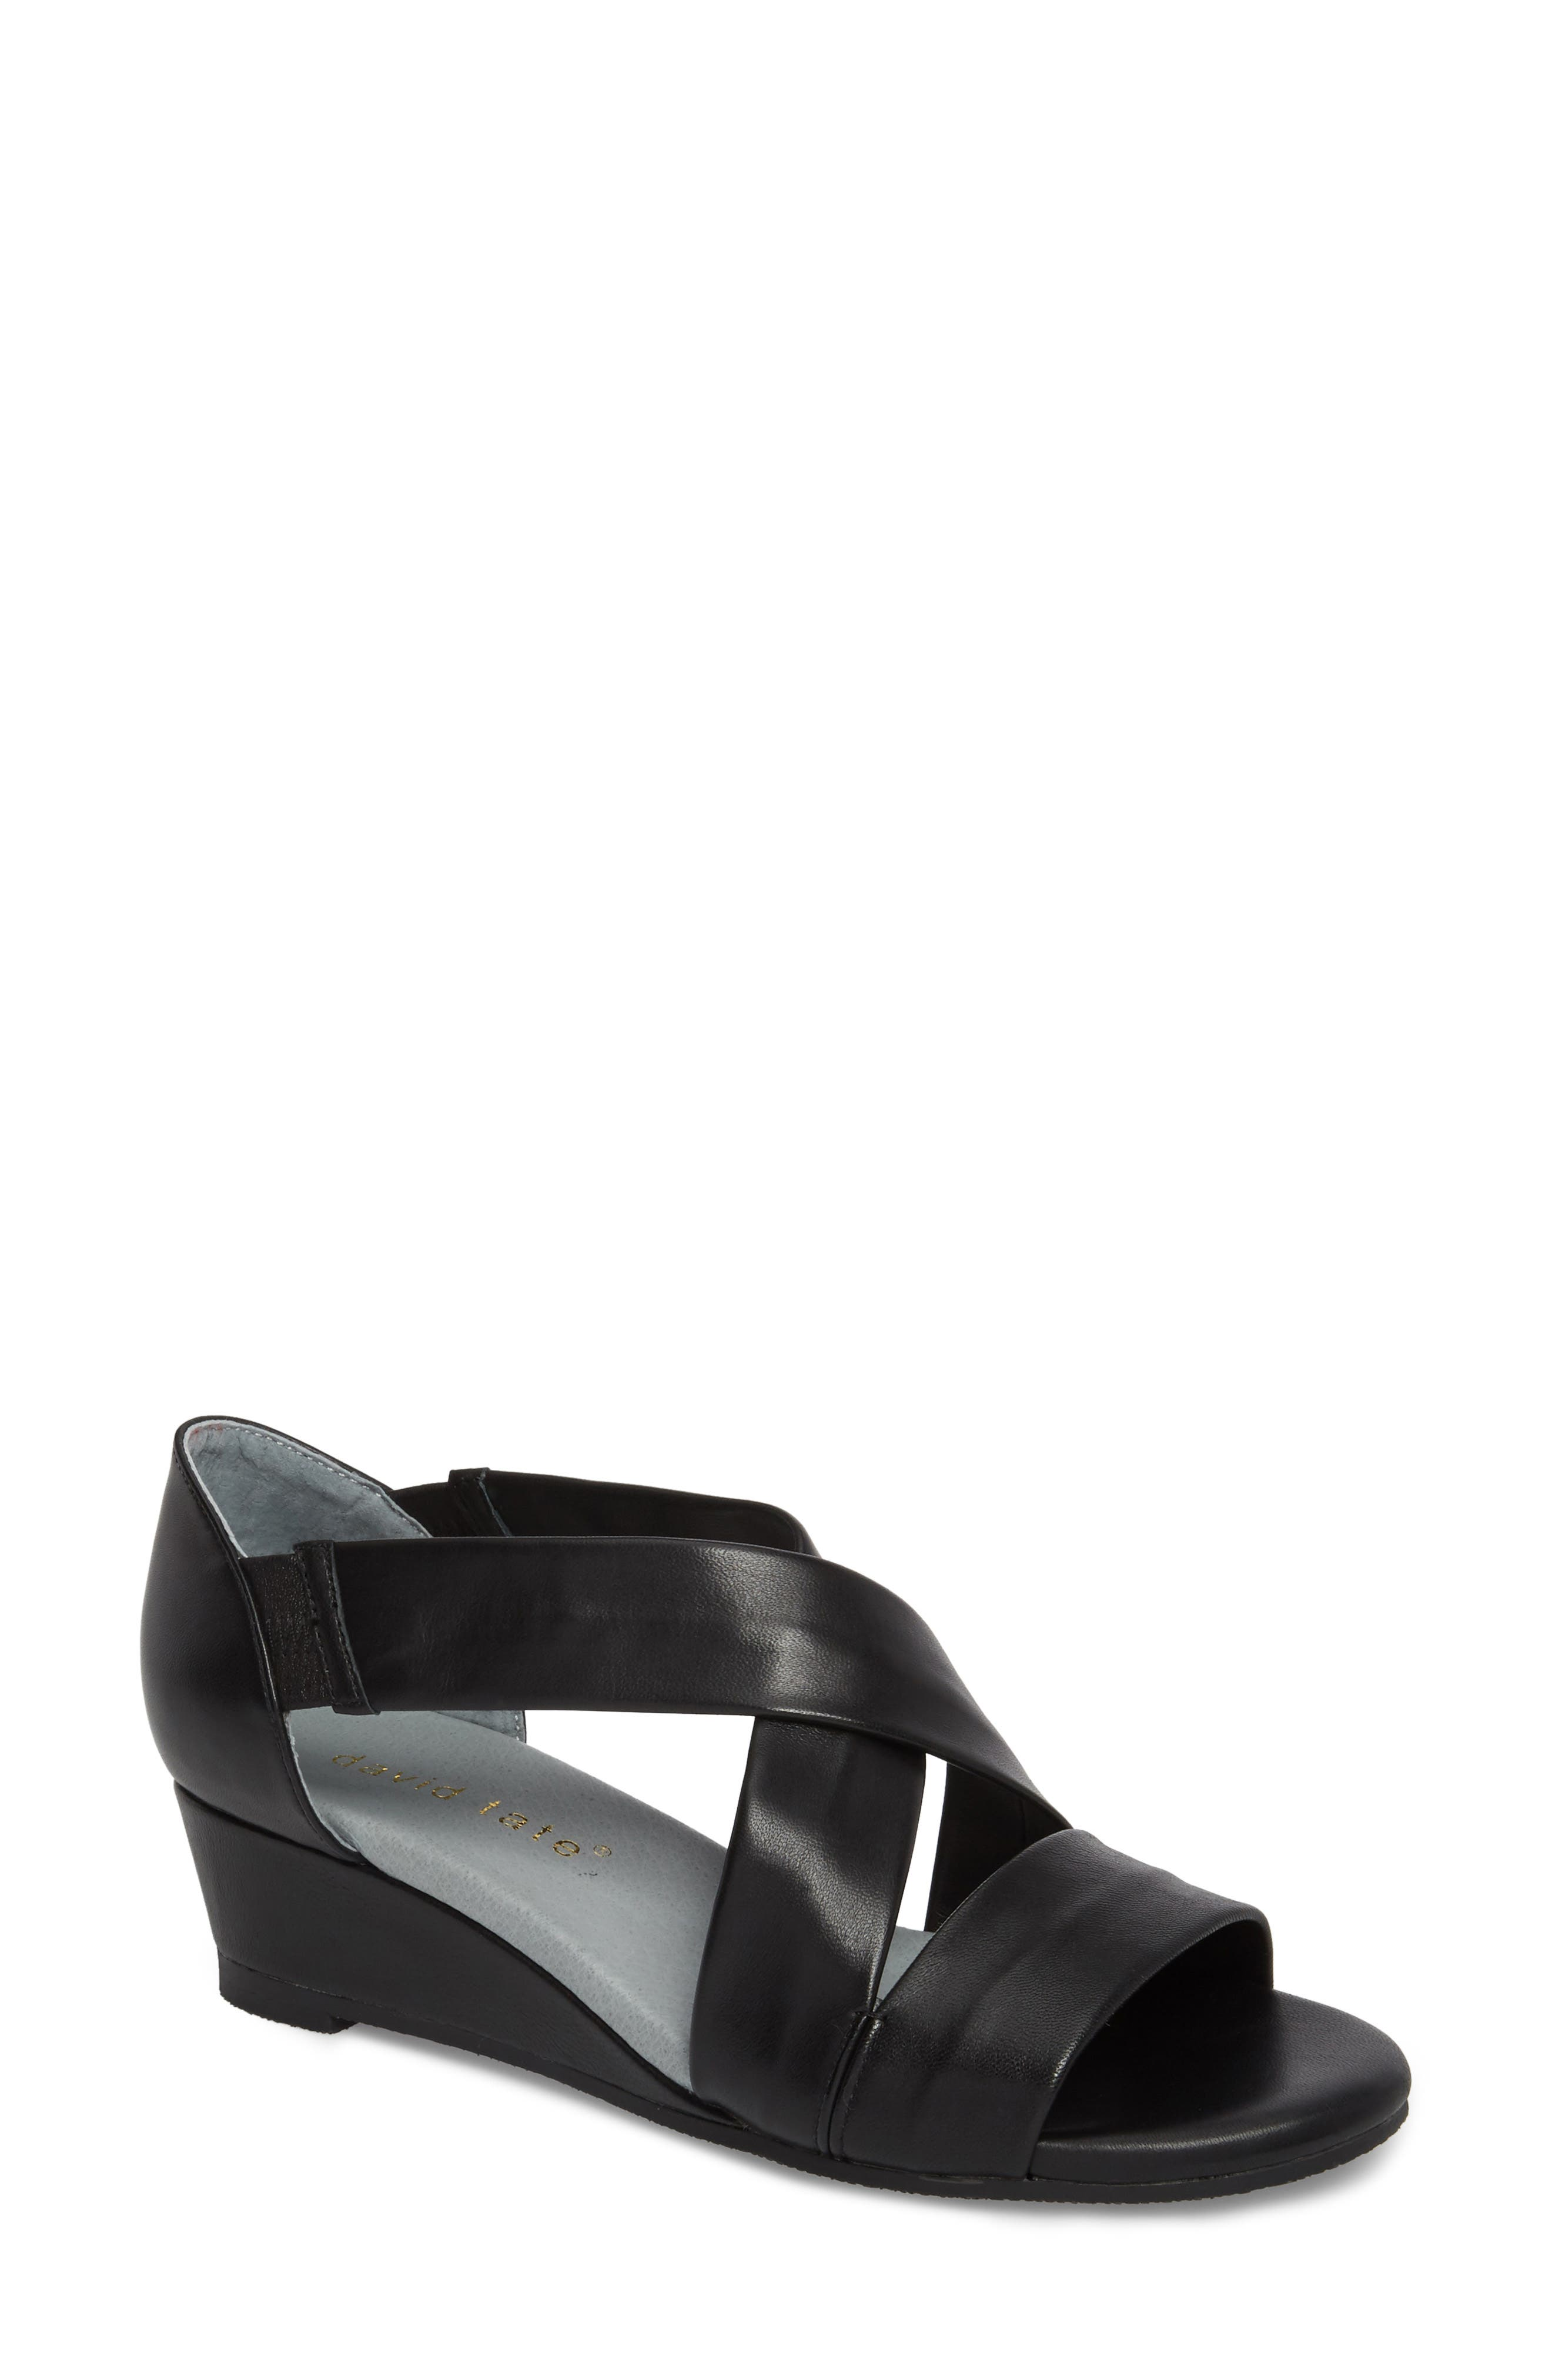 DAVID TATE Swell Cross Strap Wedge Sandal, Main, color, BLACK LEATHER